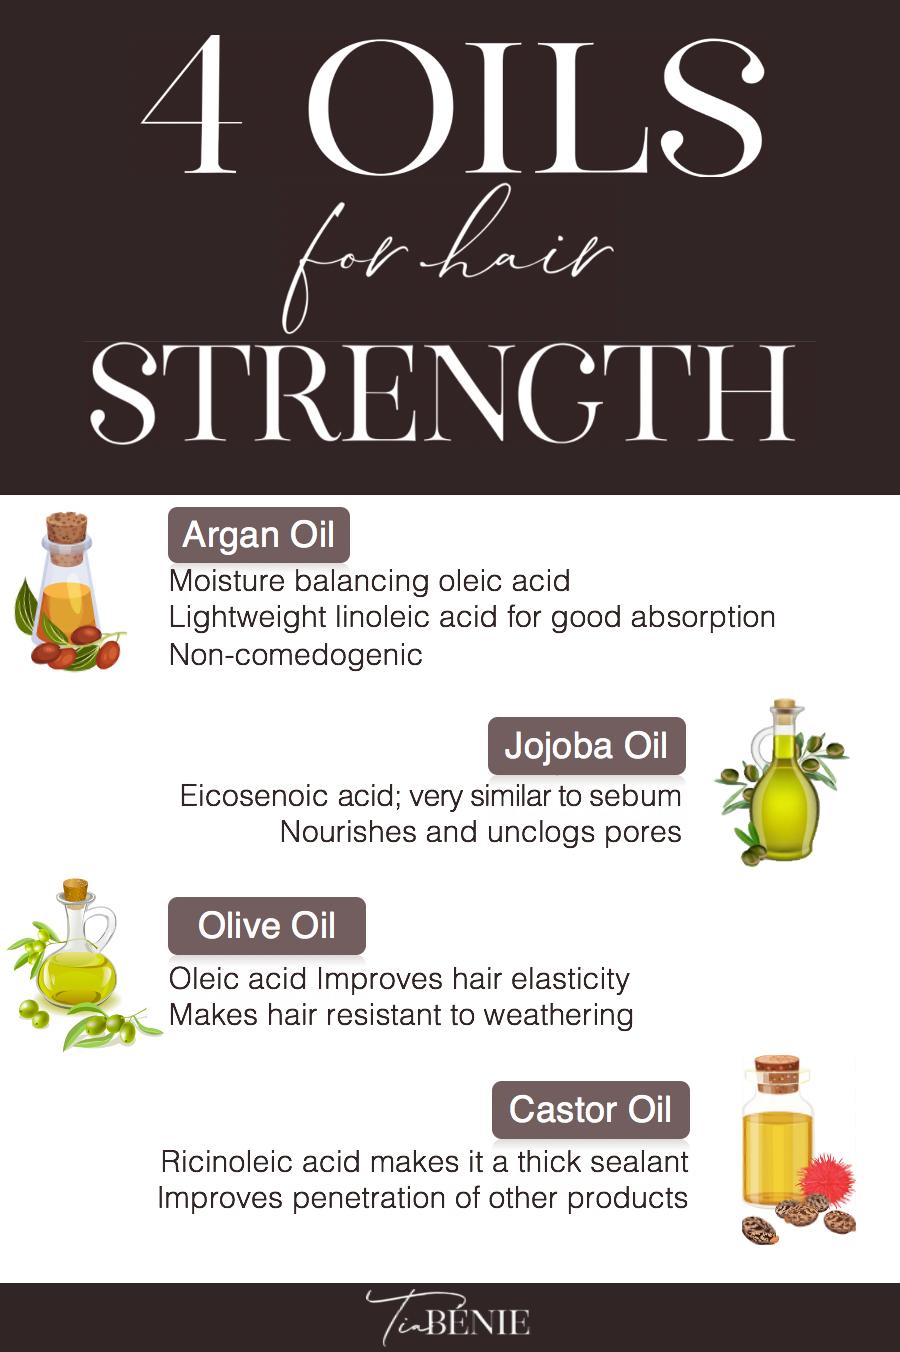 Argan Oil, Jojoba Oil, Olive Oil and Castor Oil are amazing oils to treat dry winter hari